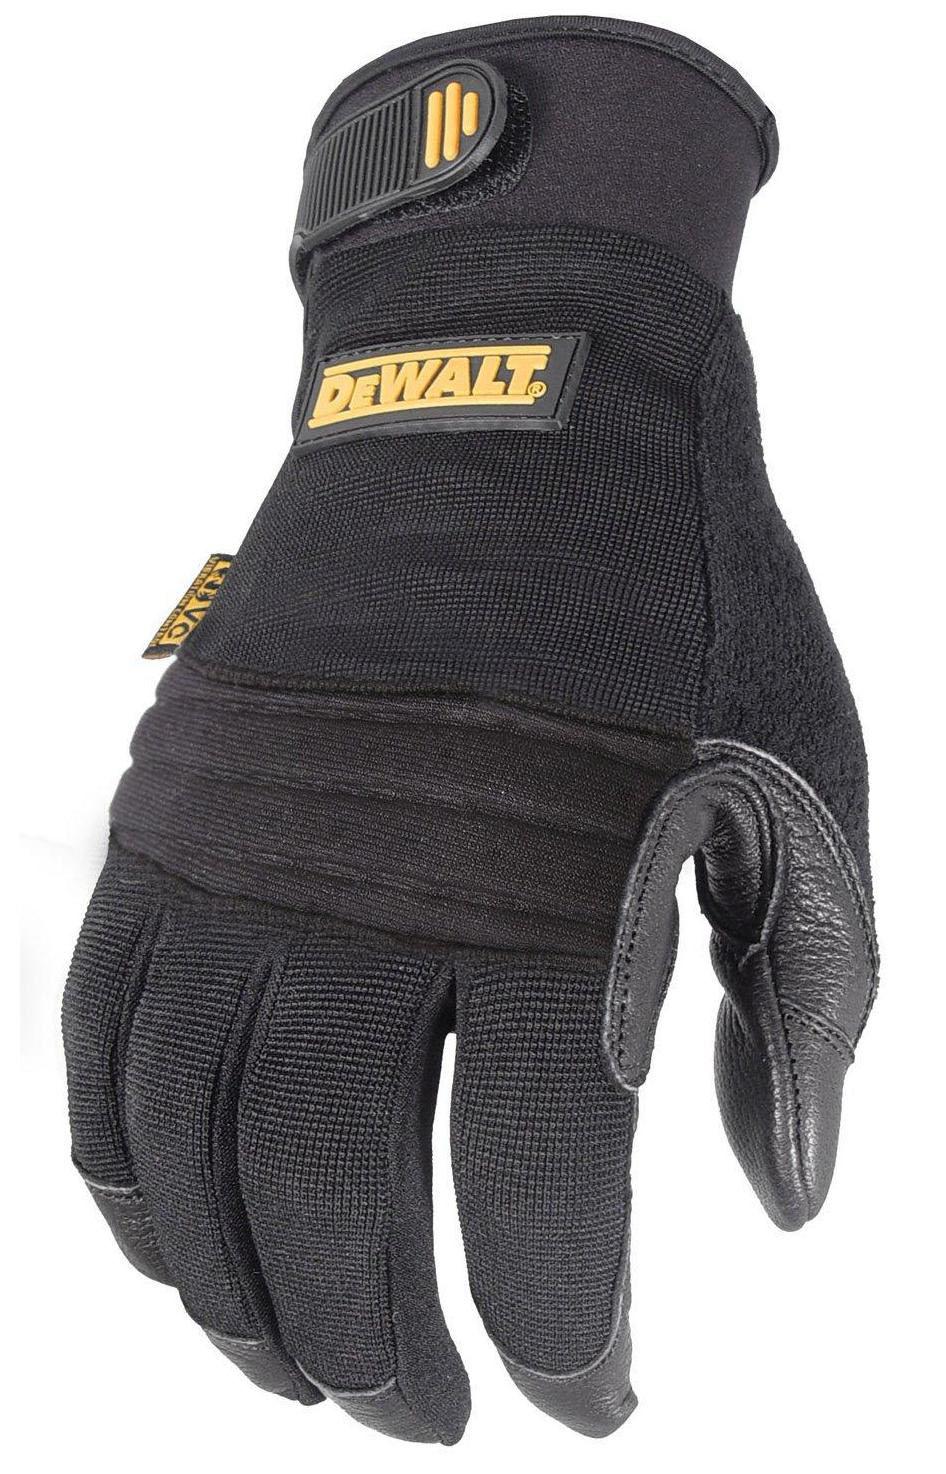 - Vibration Absorption Leather Glove